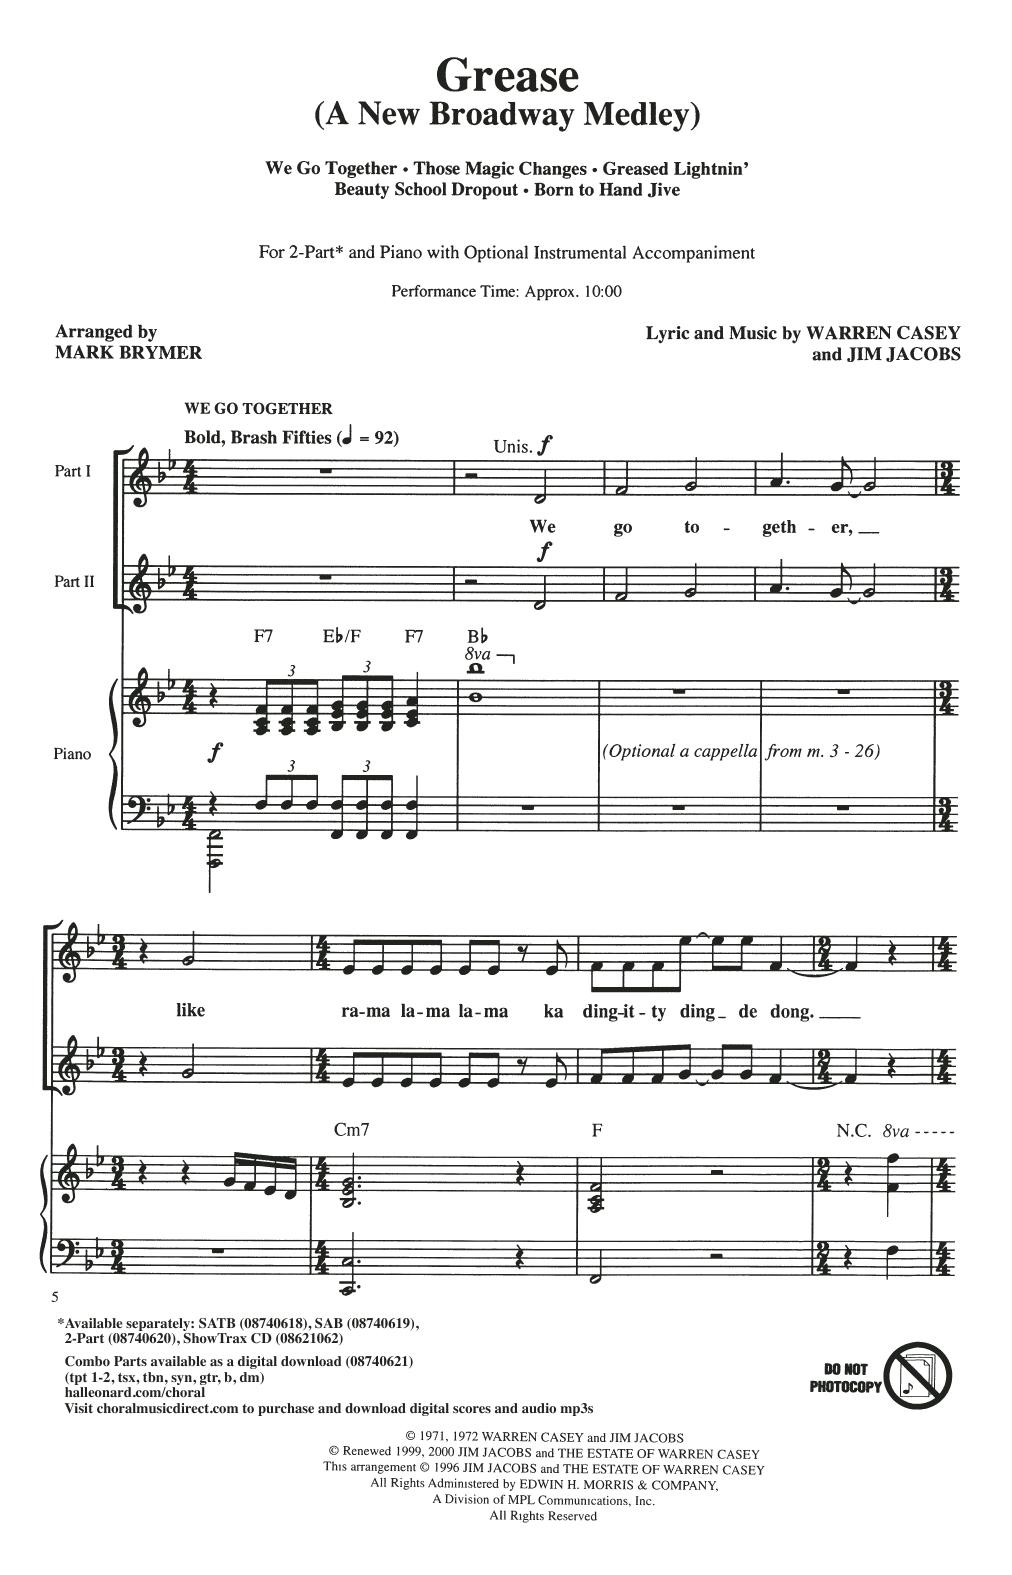 Grease: A New Broadway Medley (arr. Mark Brymer) (2-Part Choir)